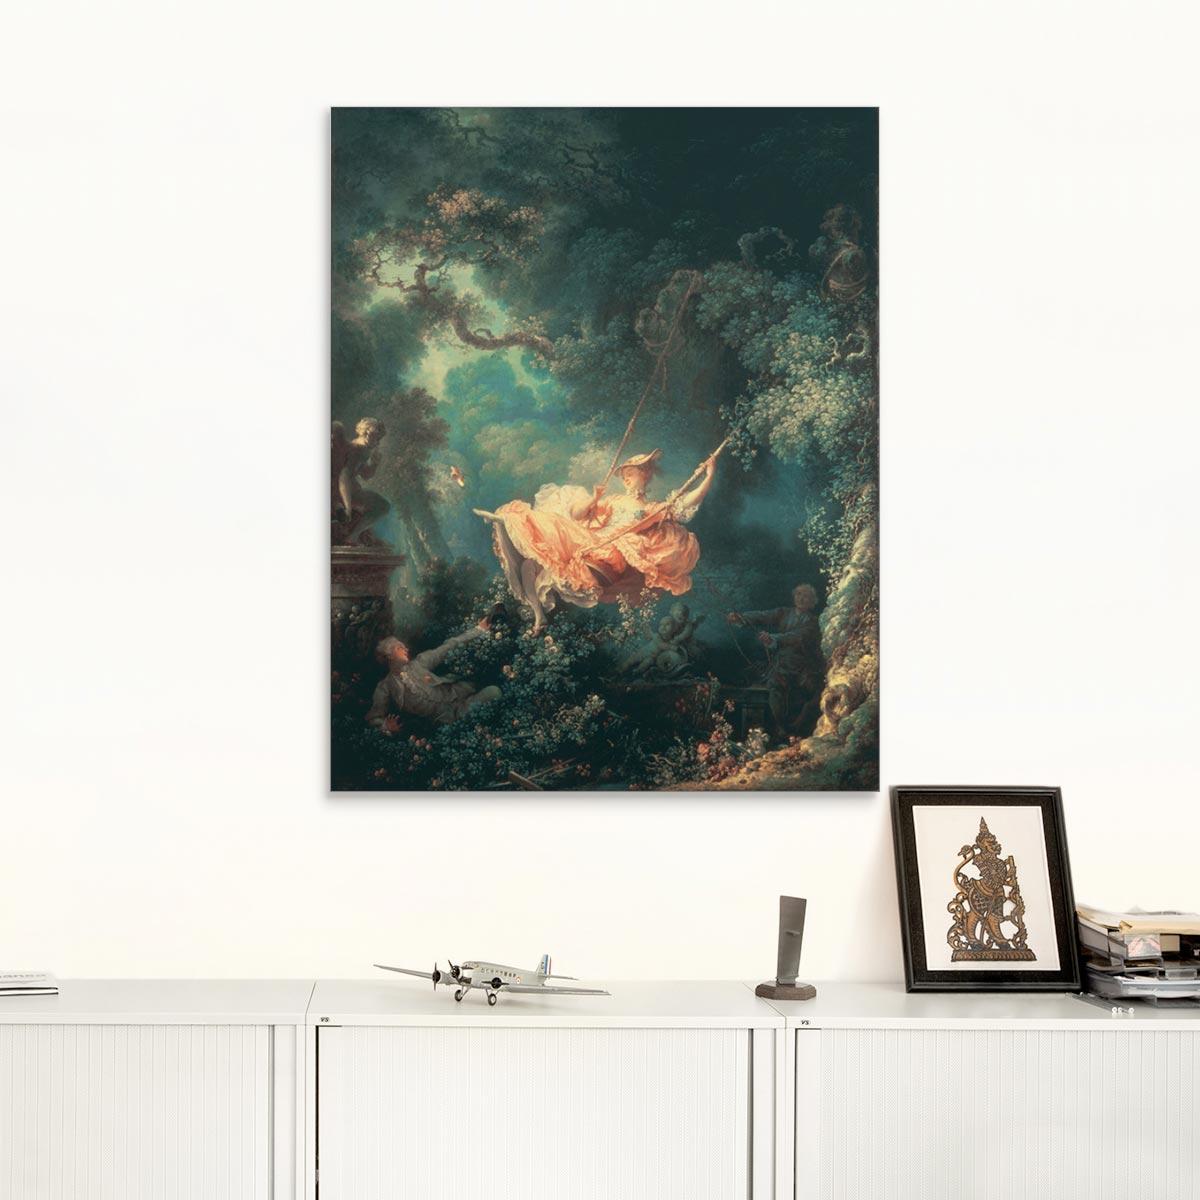 "Akustikbild ""Die Schaukel"", Jean-Honoré Fragonard"